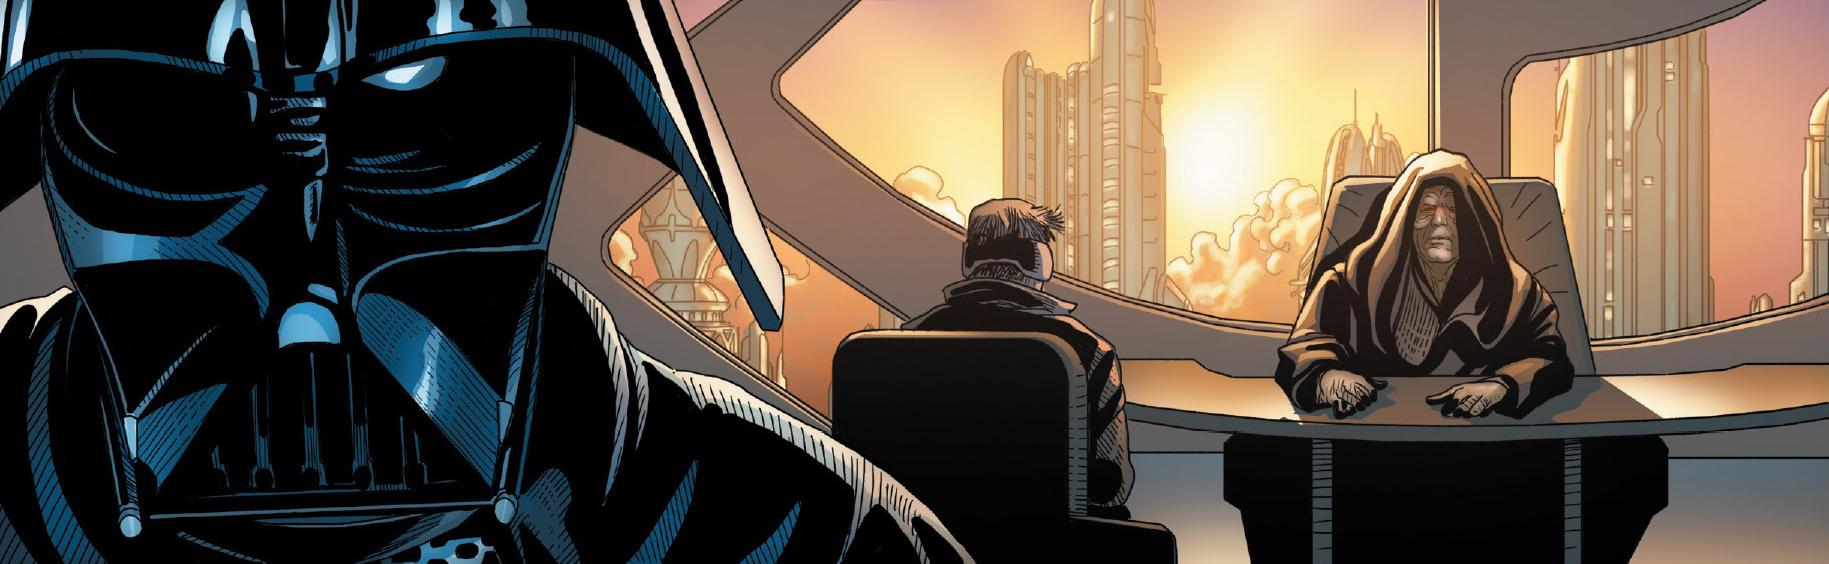 Archivo:Palpatine Vader agent.jpg